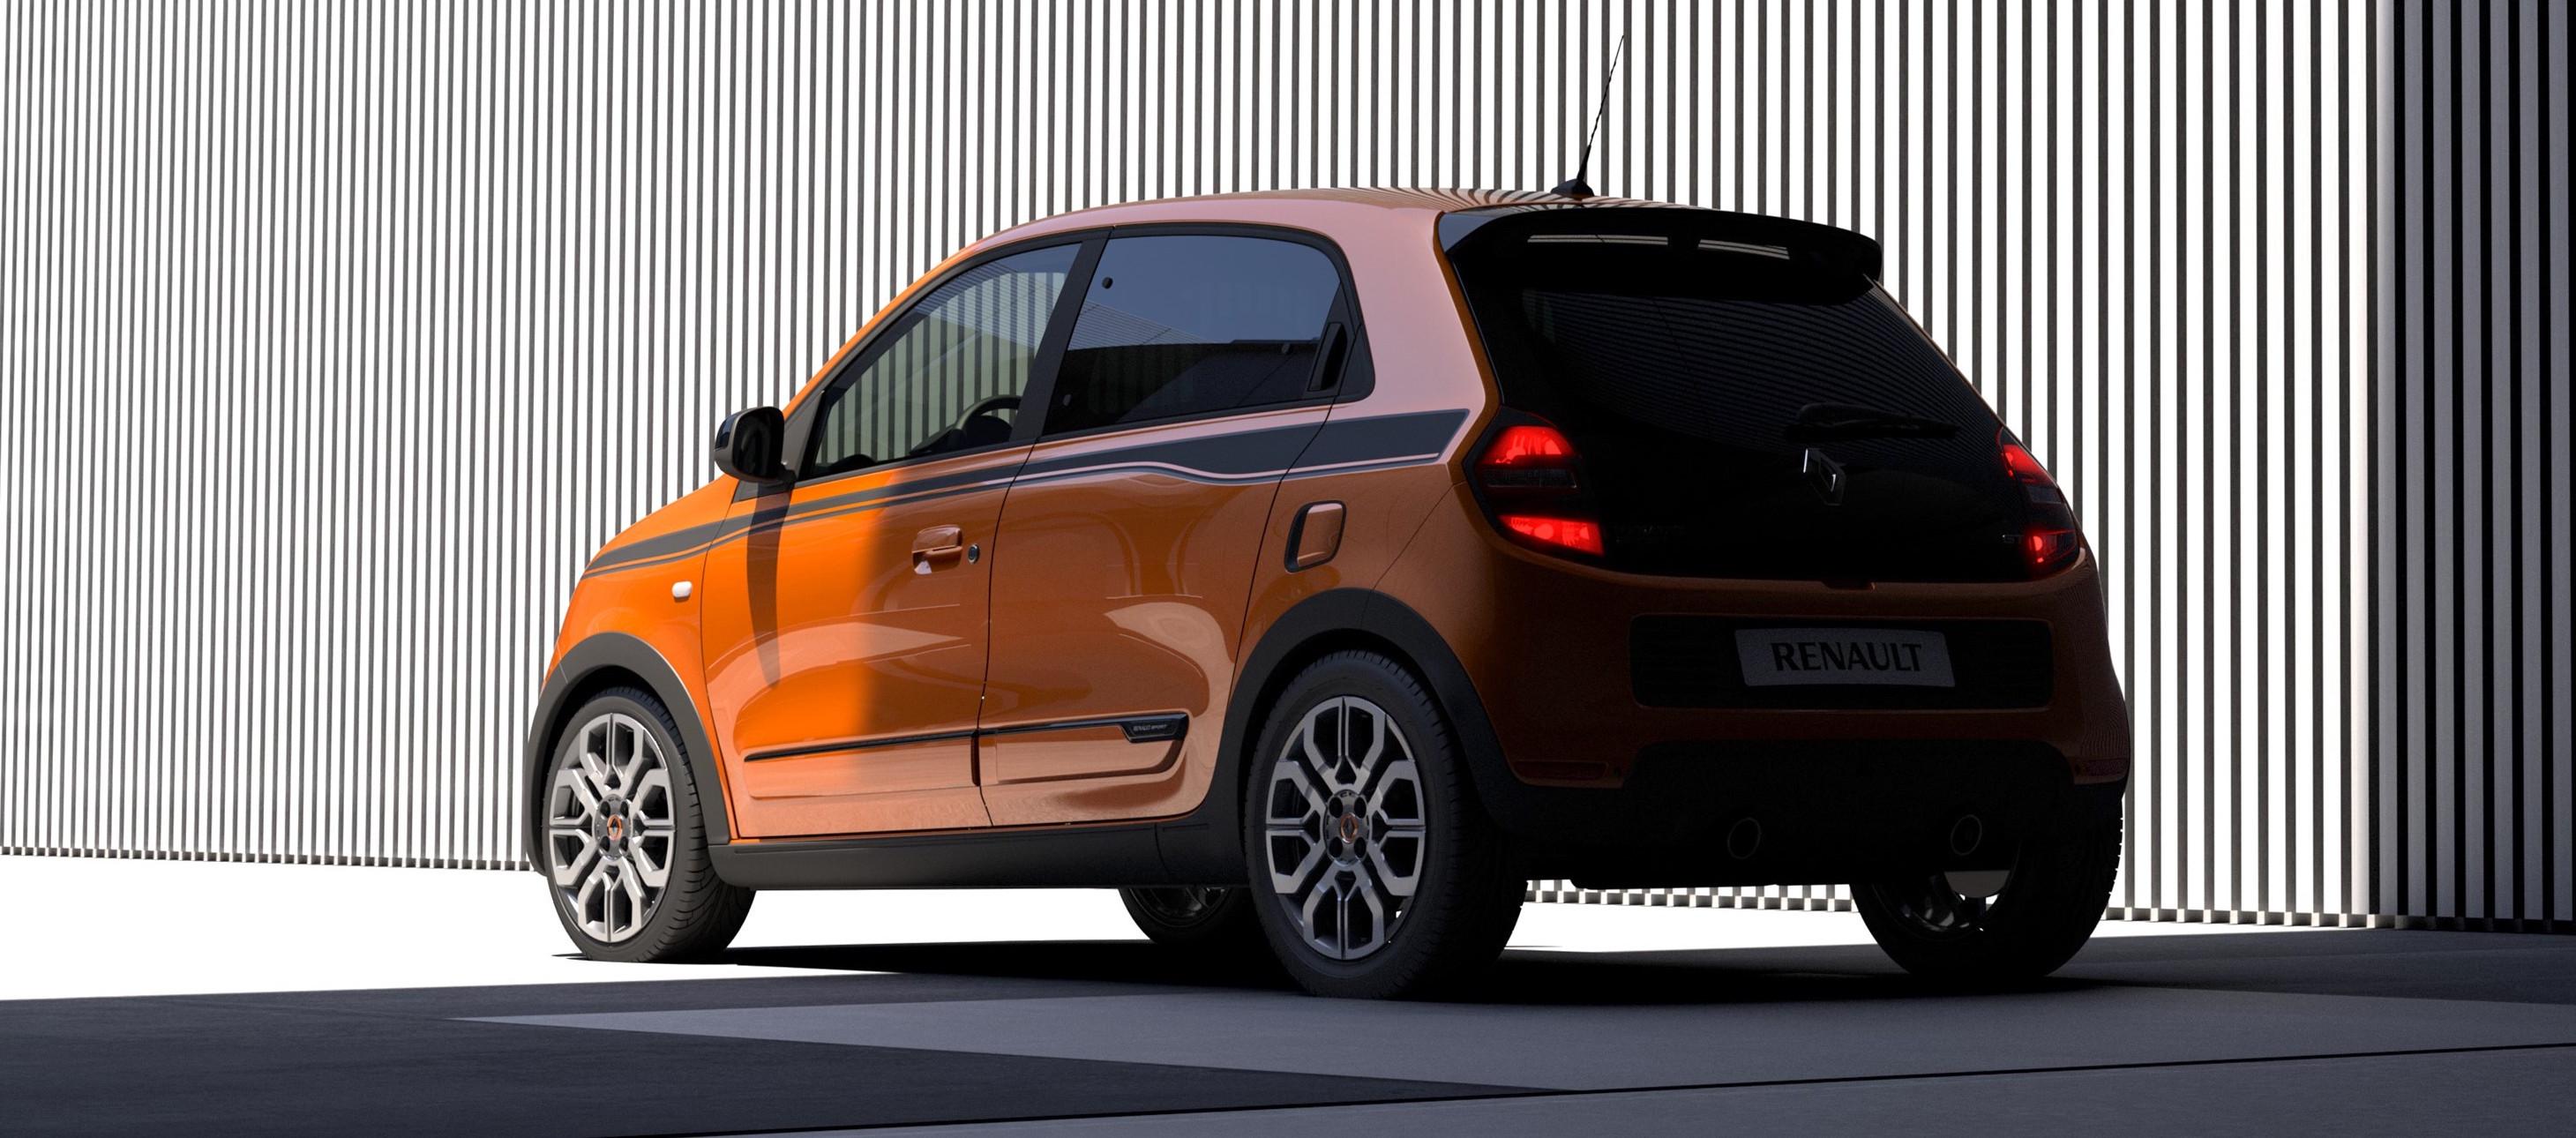 renault twingo gt rear drive city car gets renault sport boost photos 1 of 14. Black Bedroom Furniture Sets. Home Design Ideas